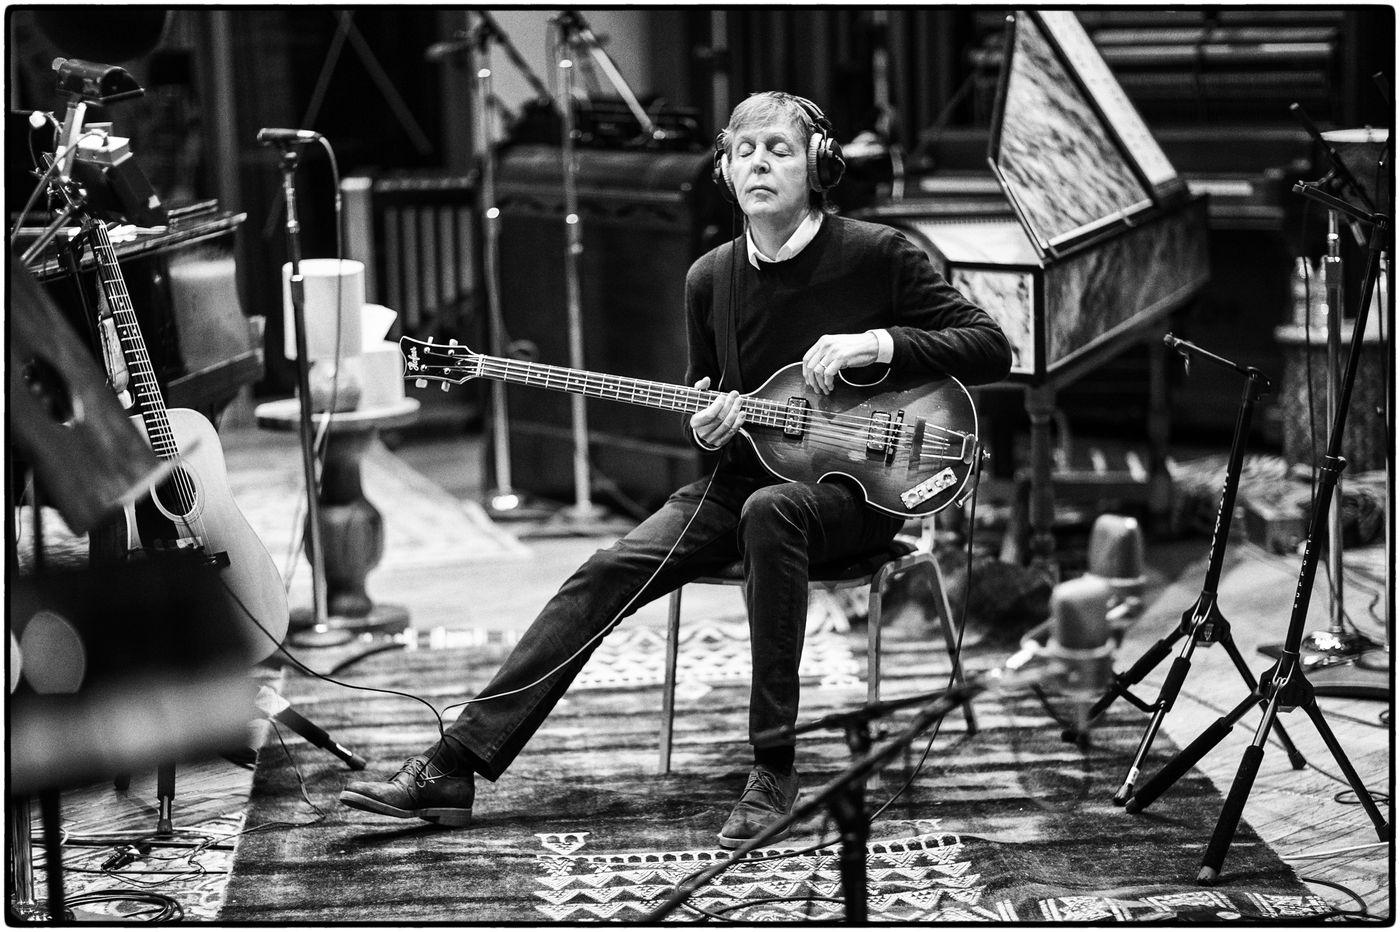 A tale of two Pauls: McCartney moves ahead, Simon looks back